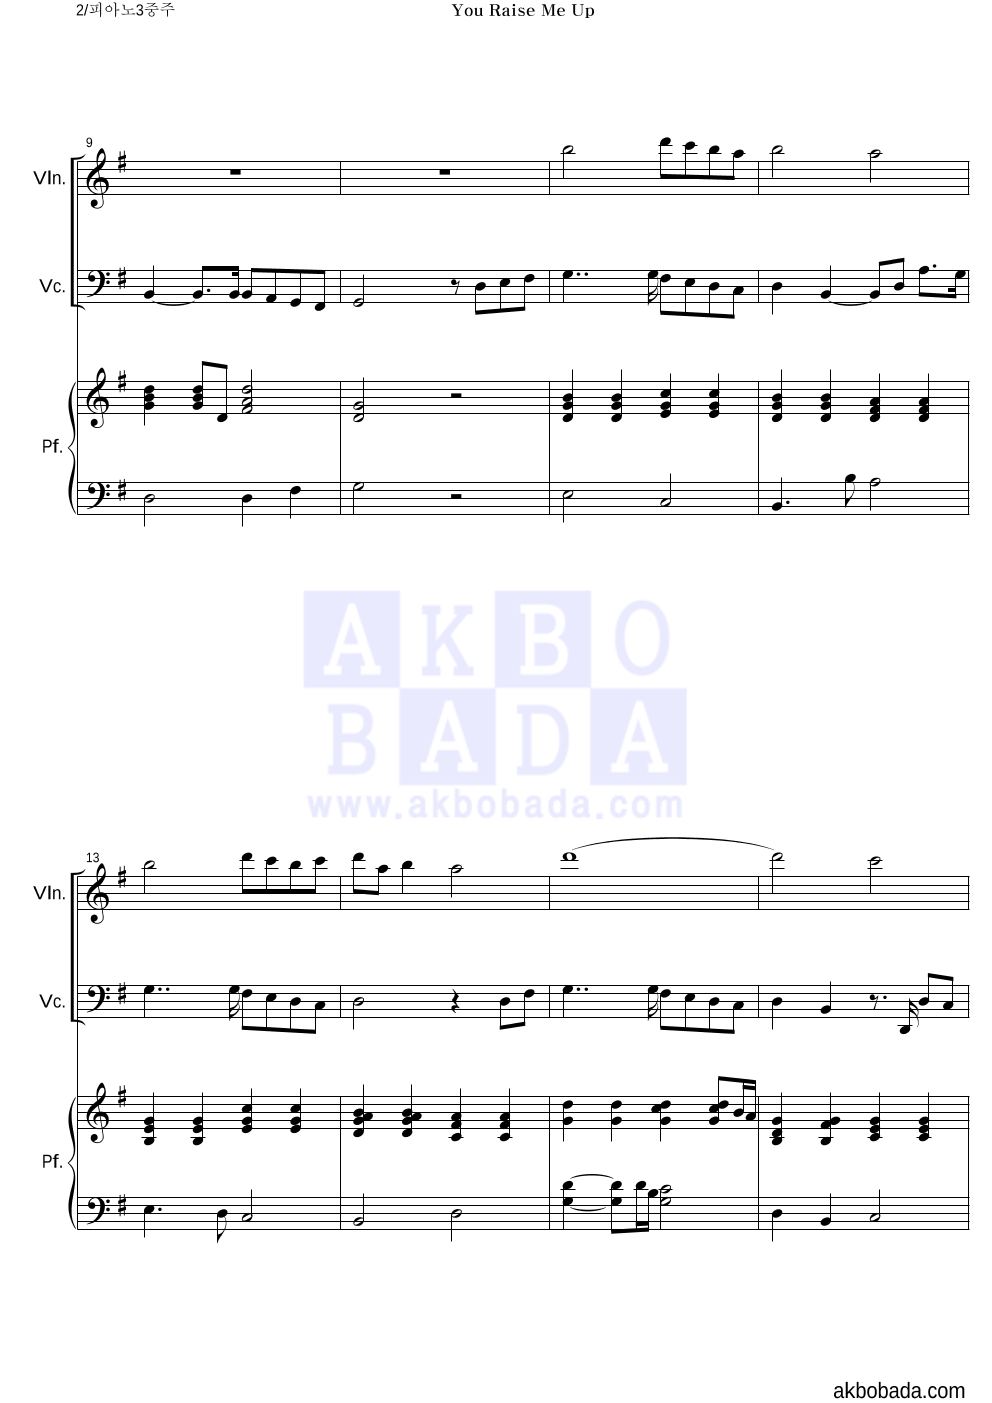 Westlife - You Raise Me Up 피아노3중주 악보